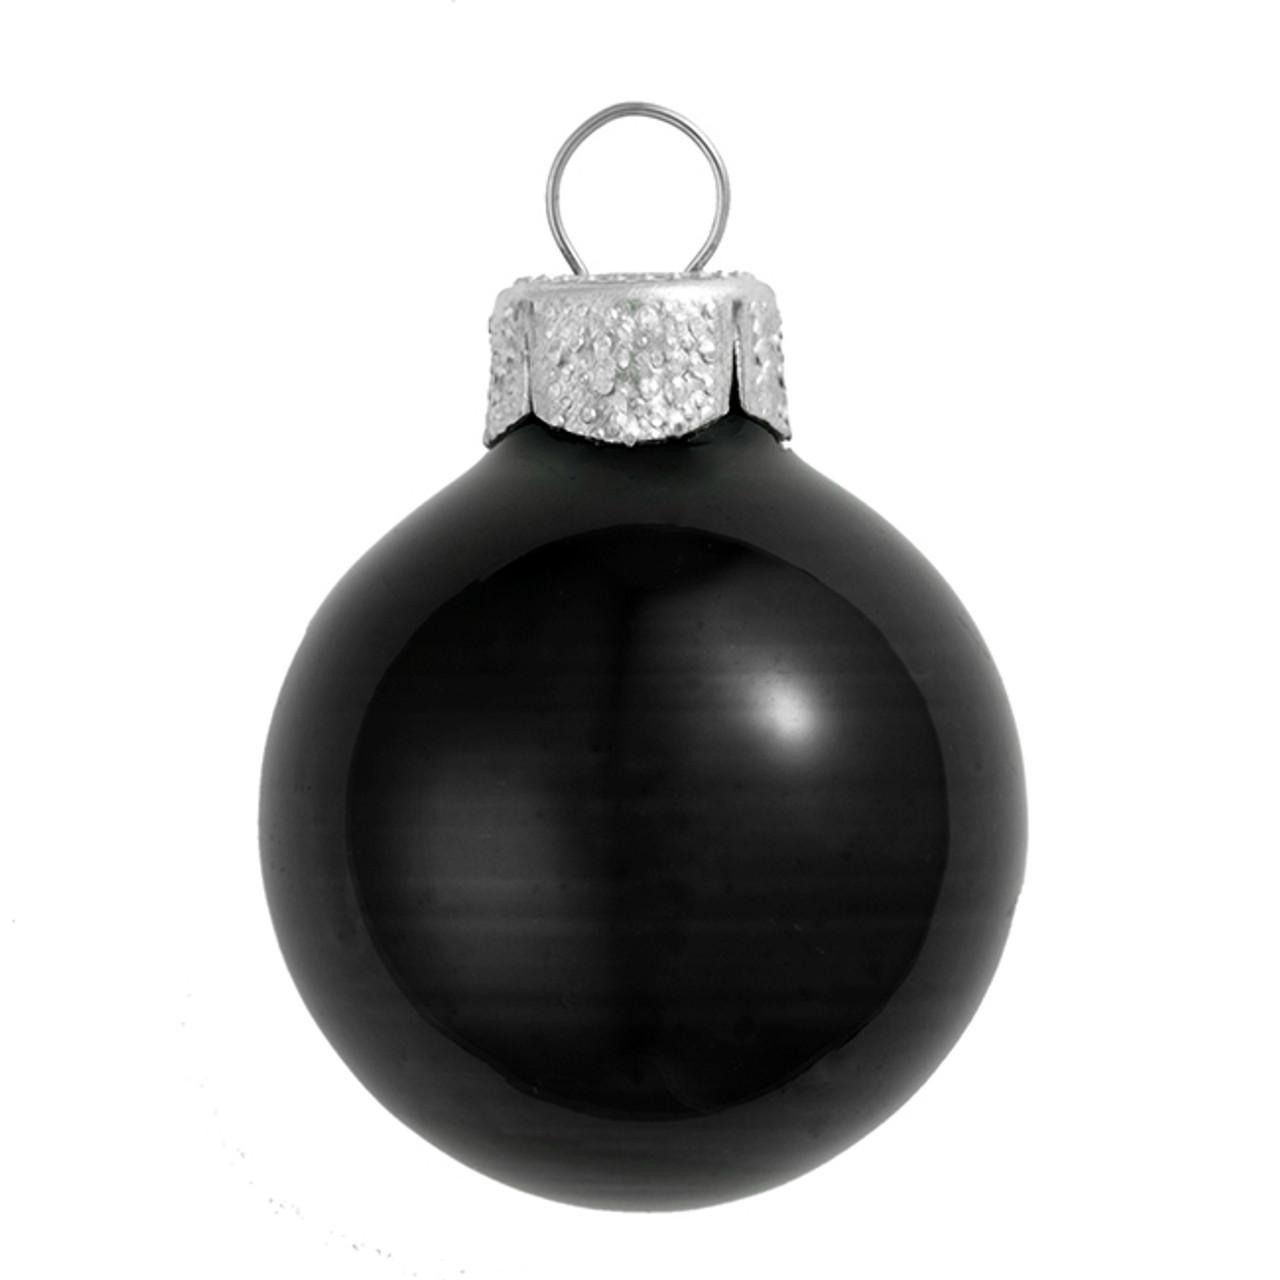 whitehurst - Black Christmas Ornaments